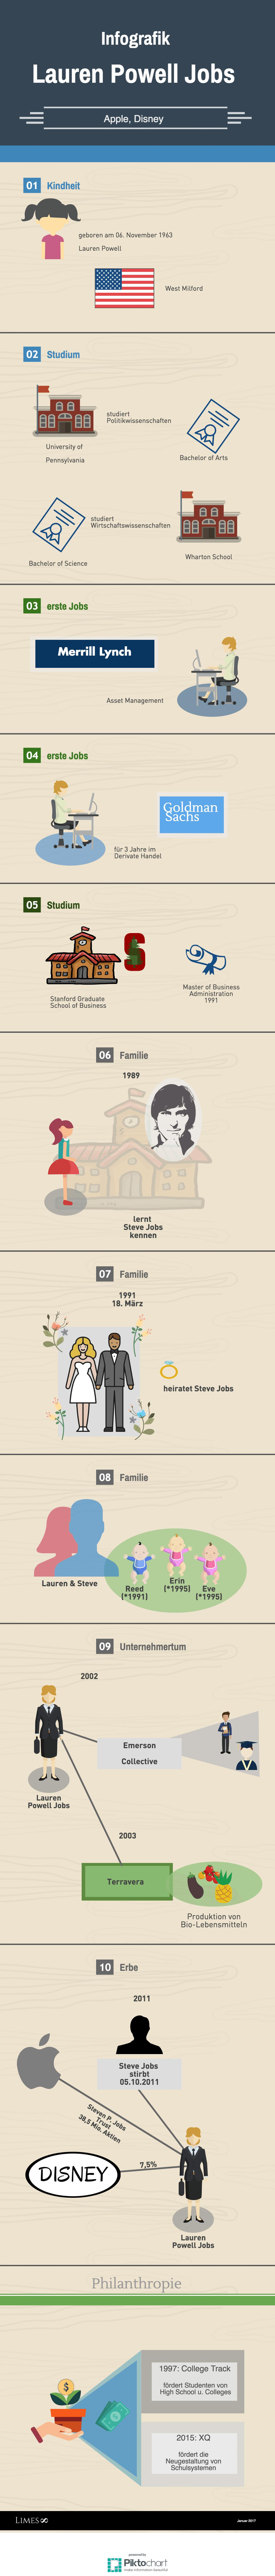 Informationsgrafik der Milliardärin Lauren Powell Jobs